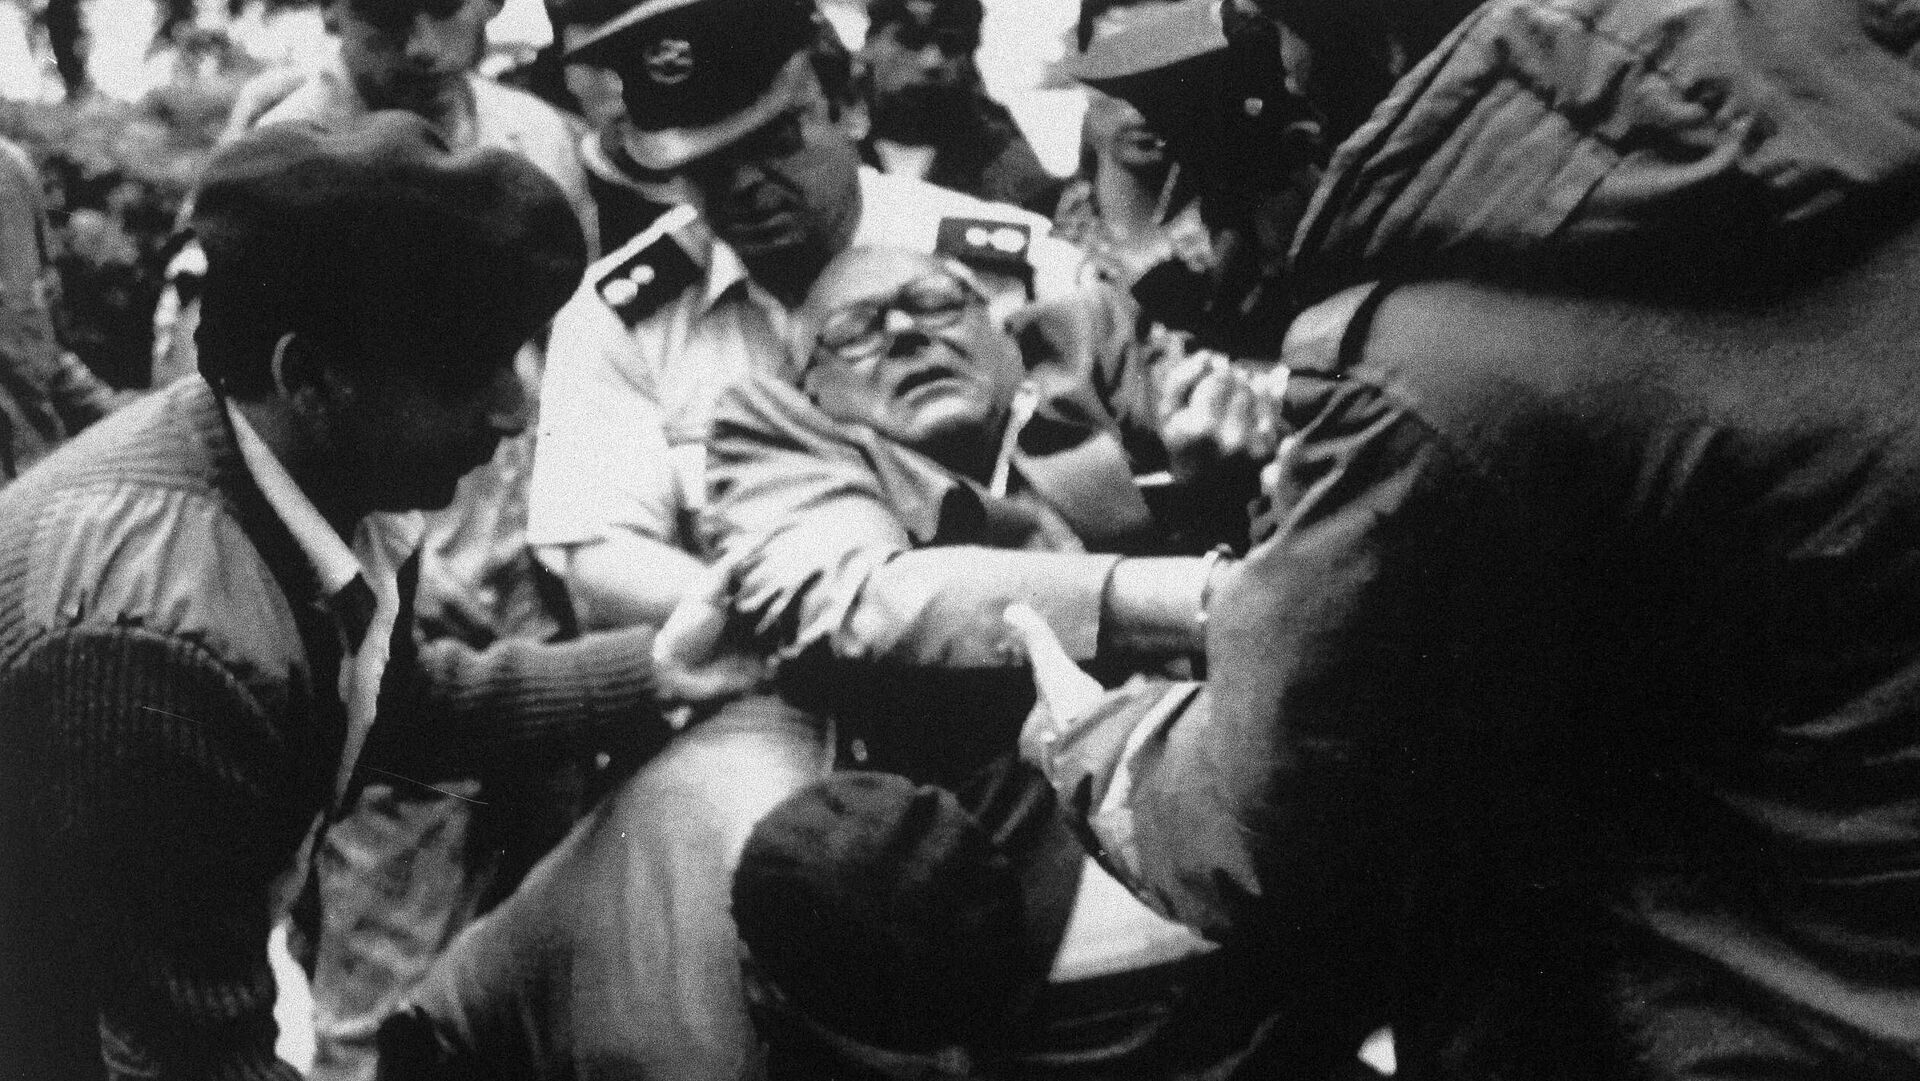 Llegada de John Demjanjuk el día del veredicto en Jerusalén - Sputnik Mundo, 1920, 16.03.2021